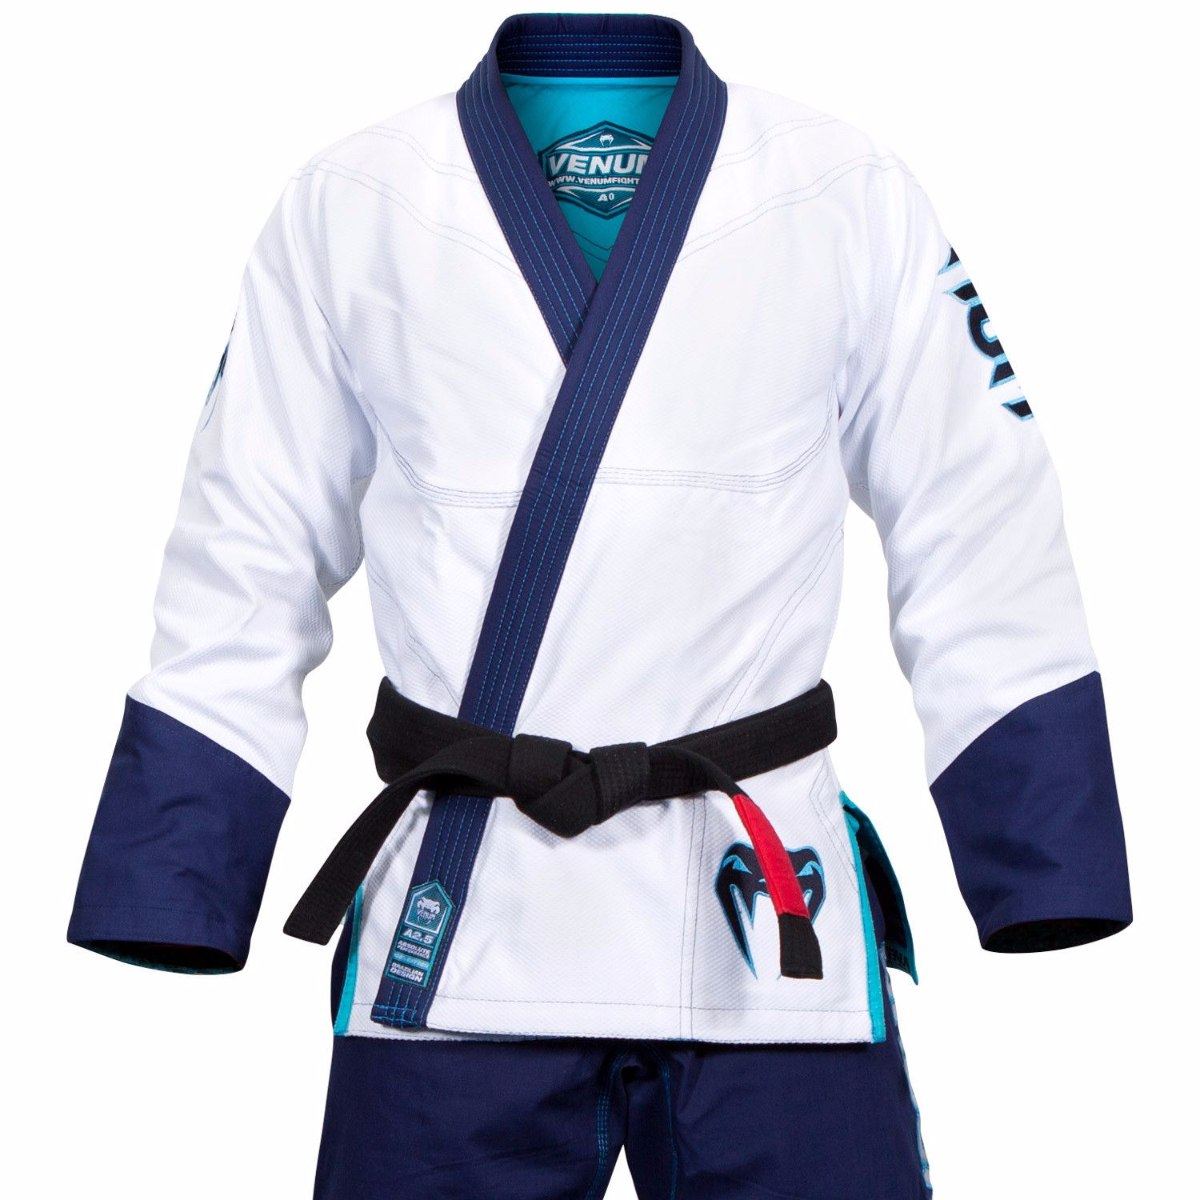 Kimono Venum Bjj Koi Gi Jiu Jitsu Brasileño Talla (a2) - $ 4,999.00 ...